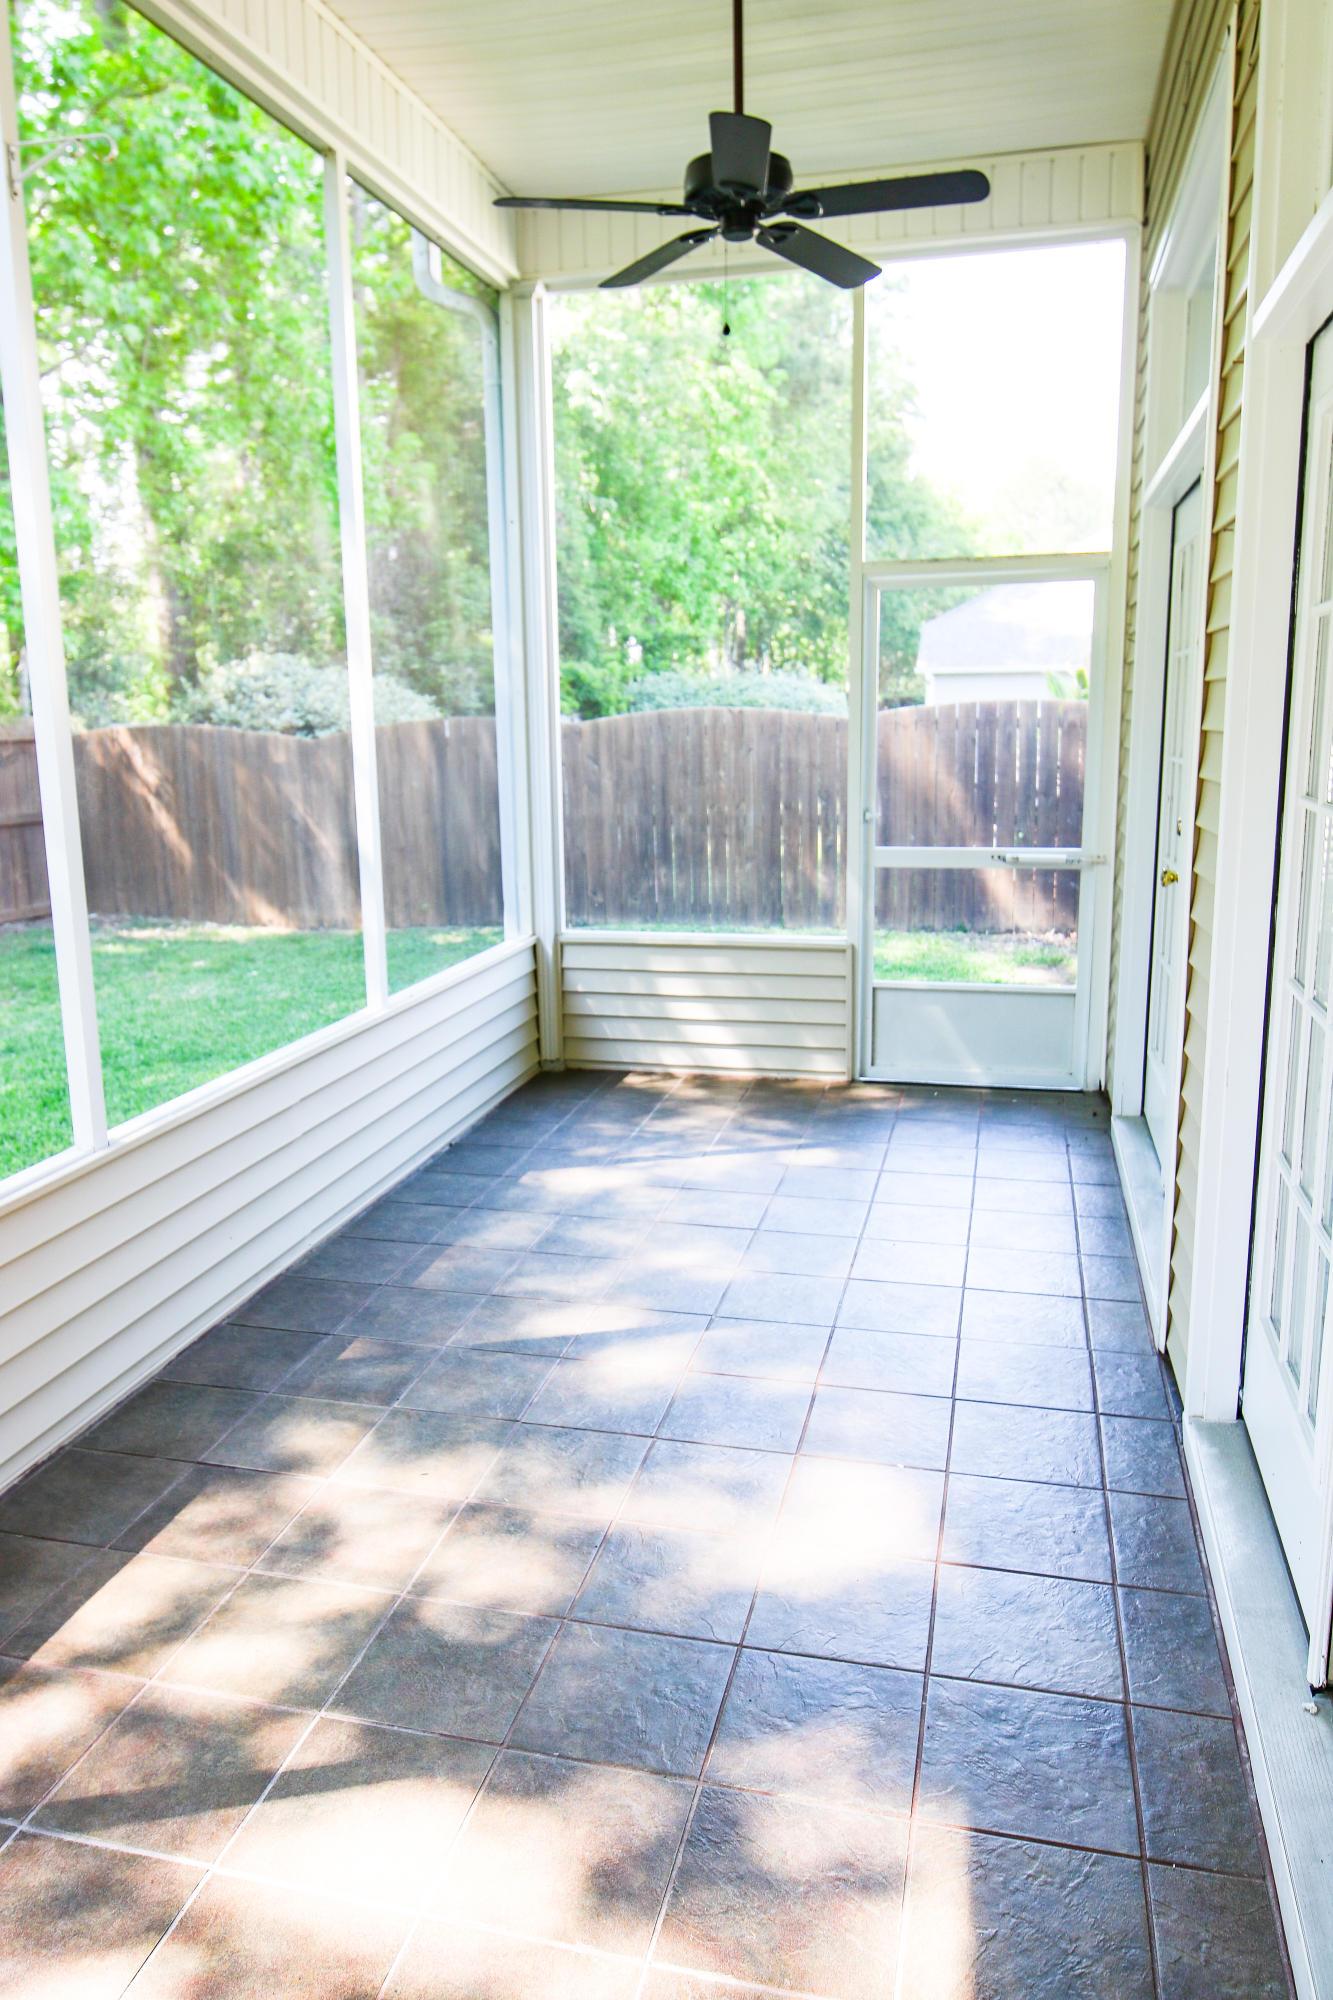 Park West Homes For Sale - 1416 Wellesley, Mount Pleasant, SC - 3